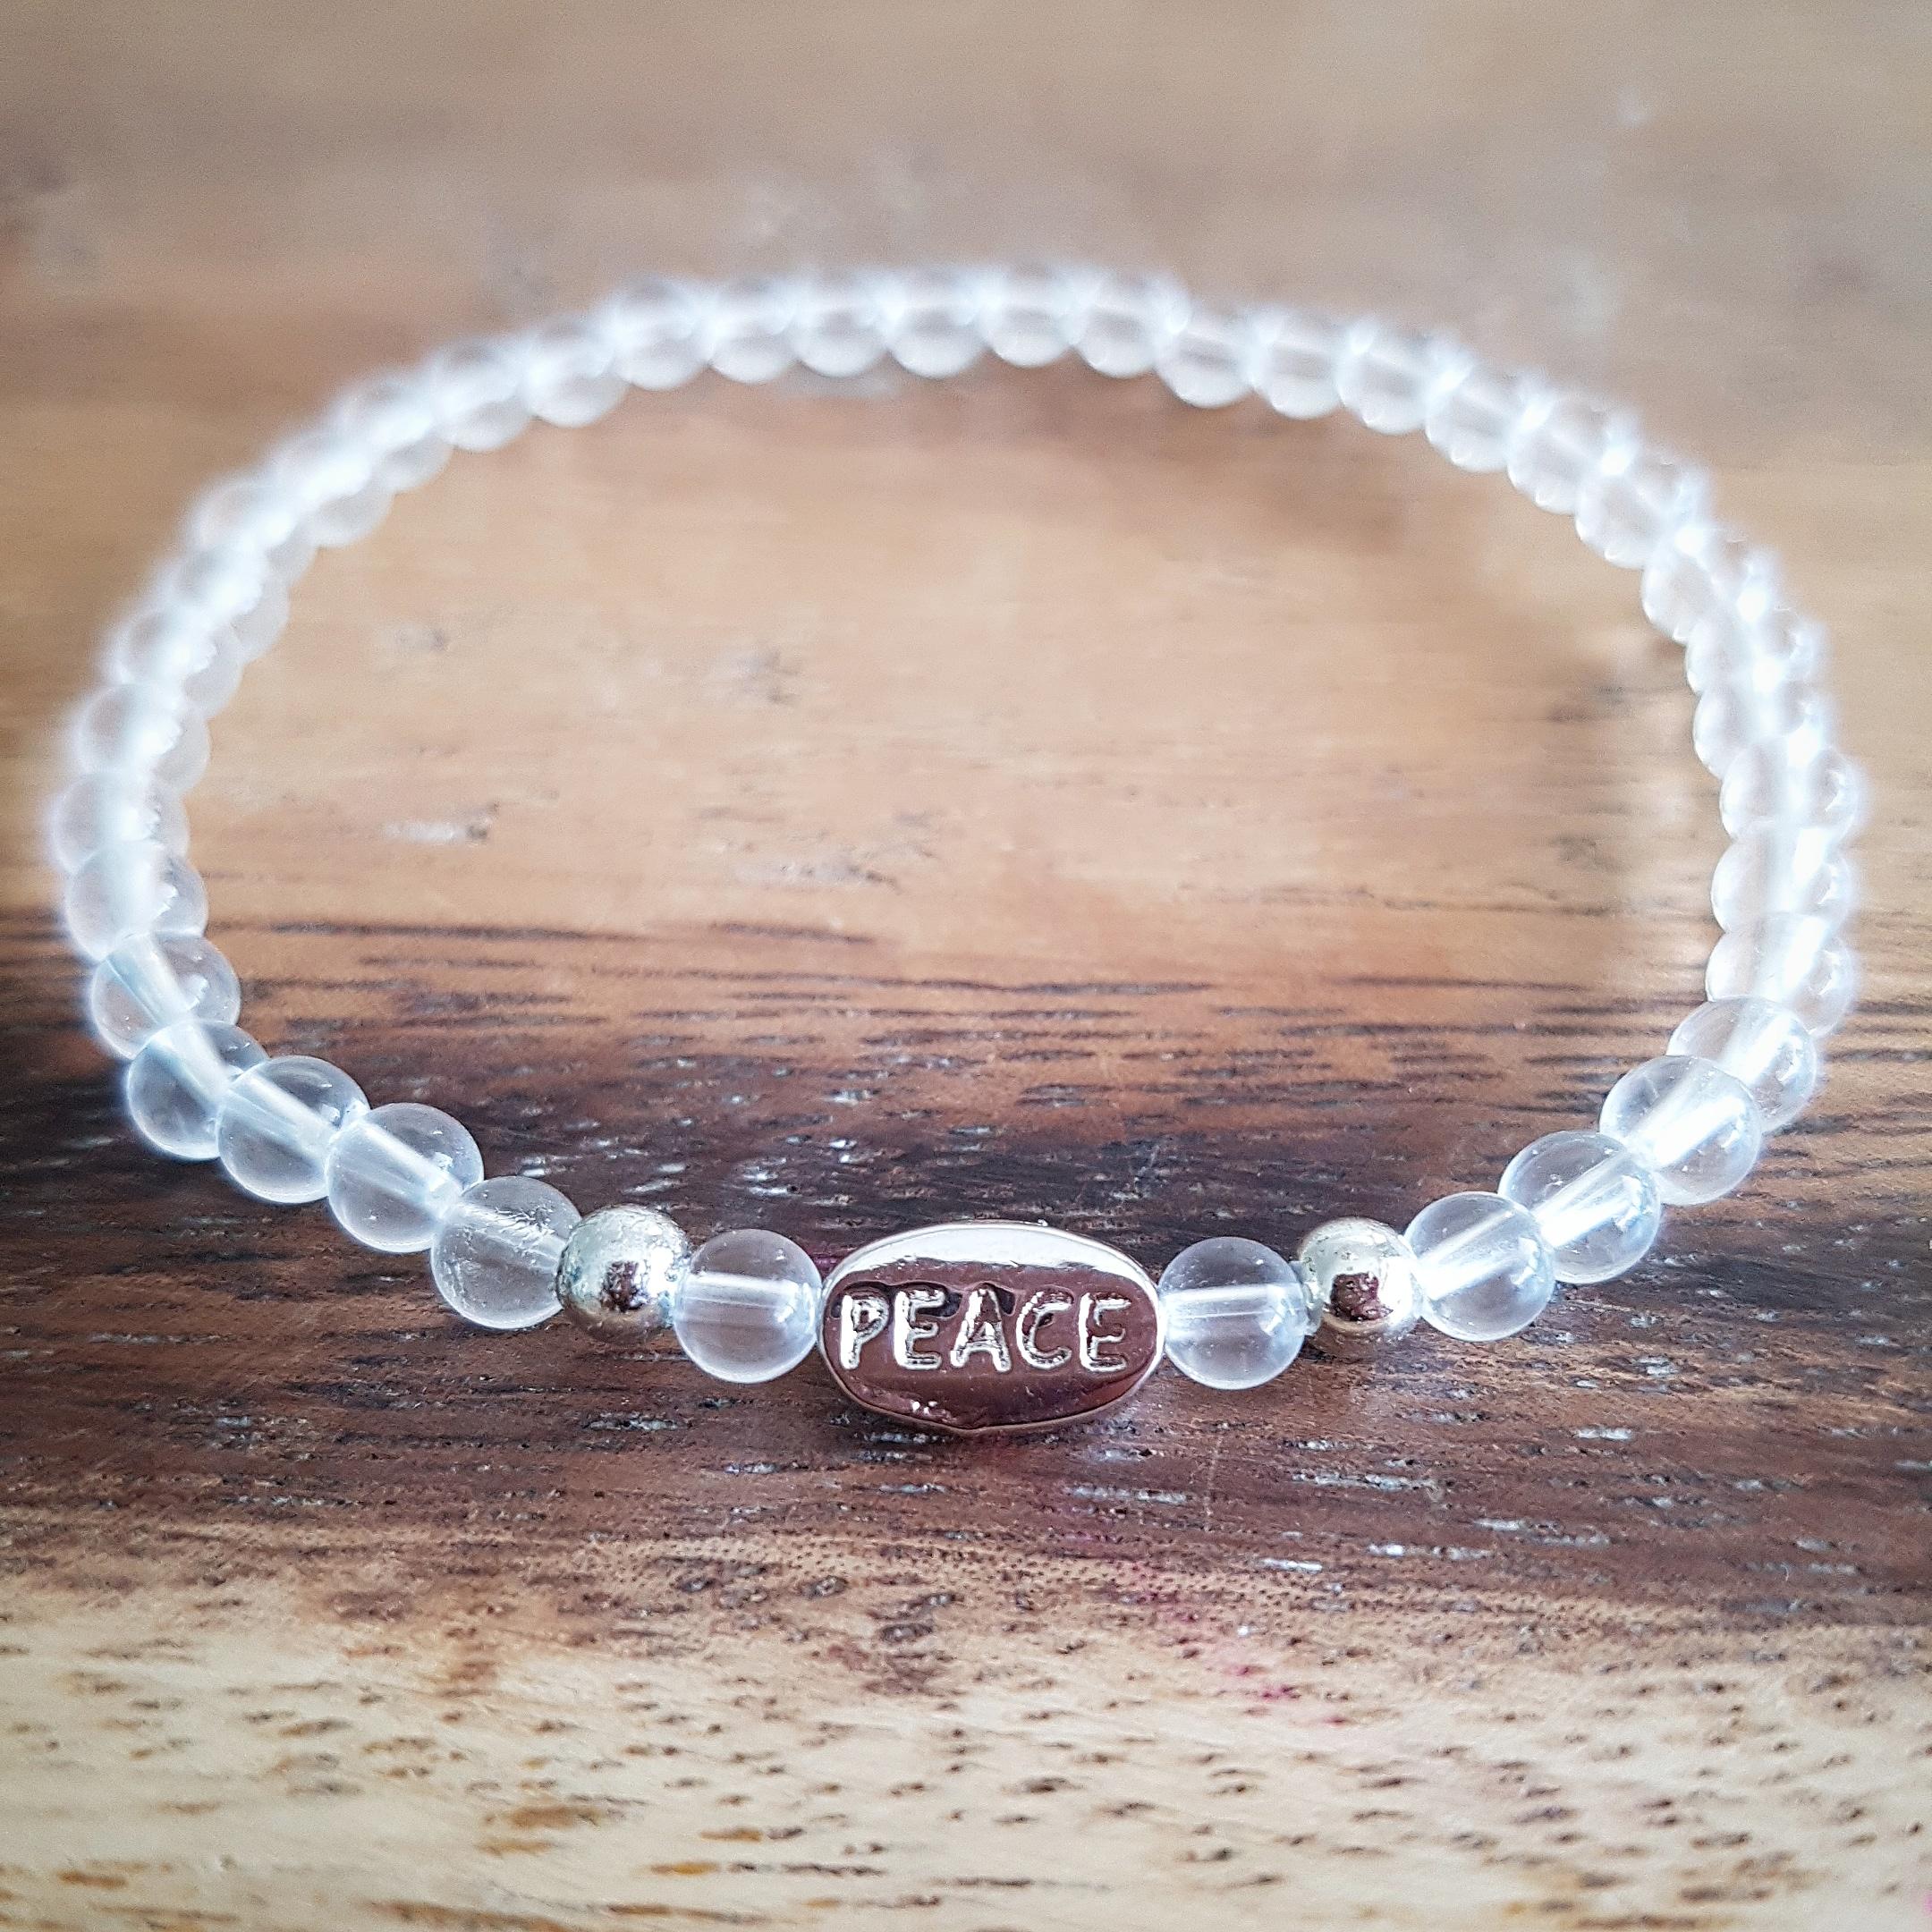 Bergkristal armband peace